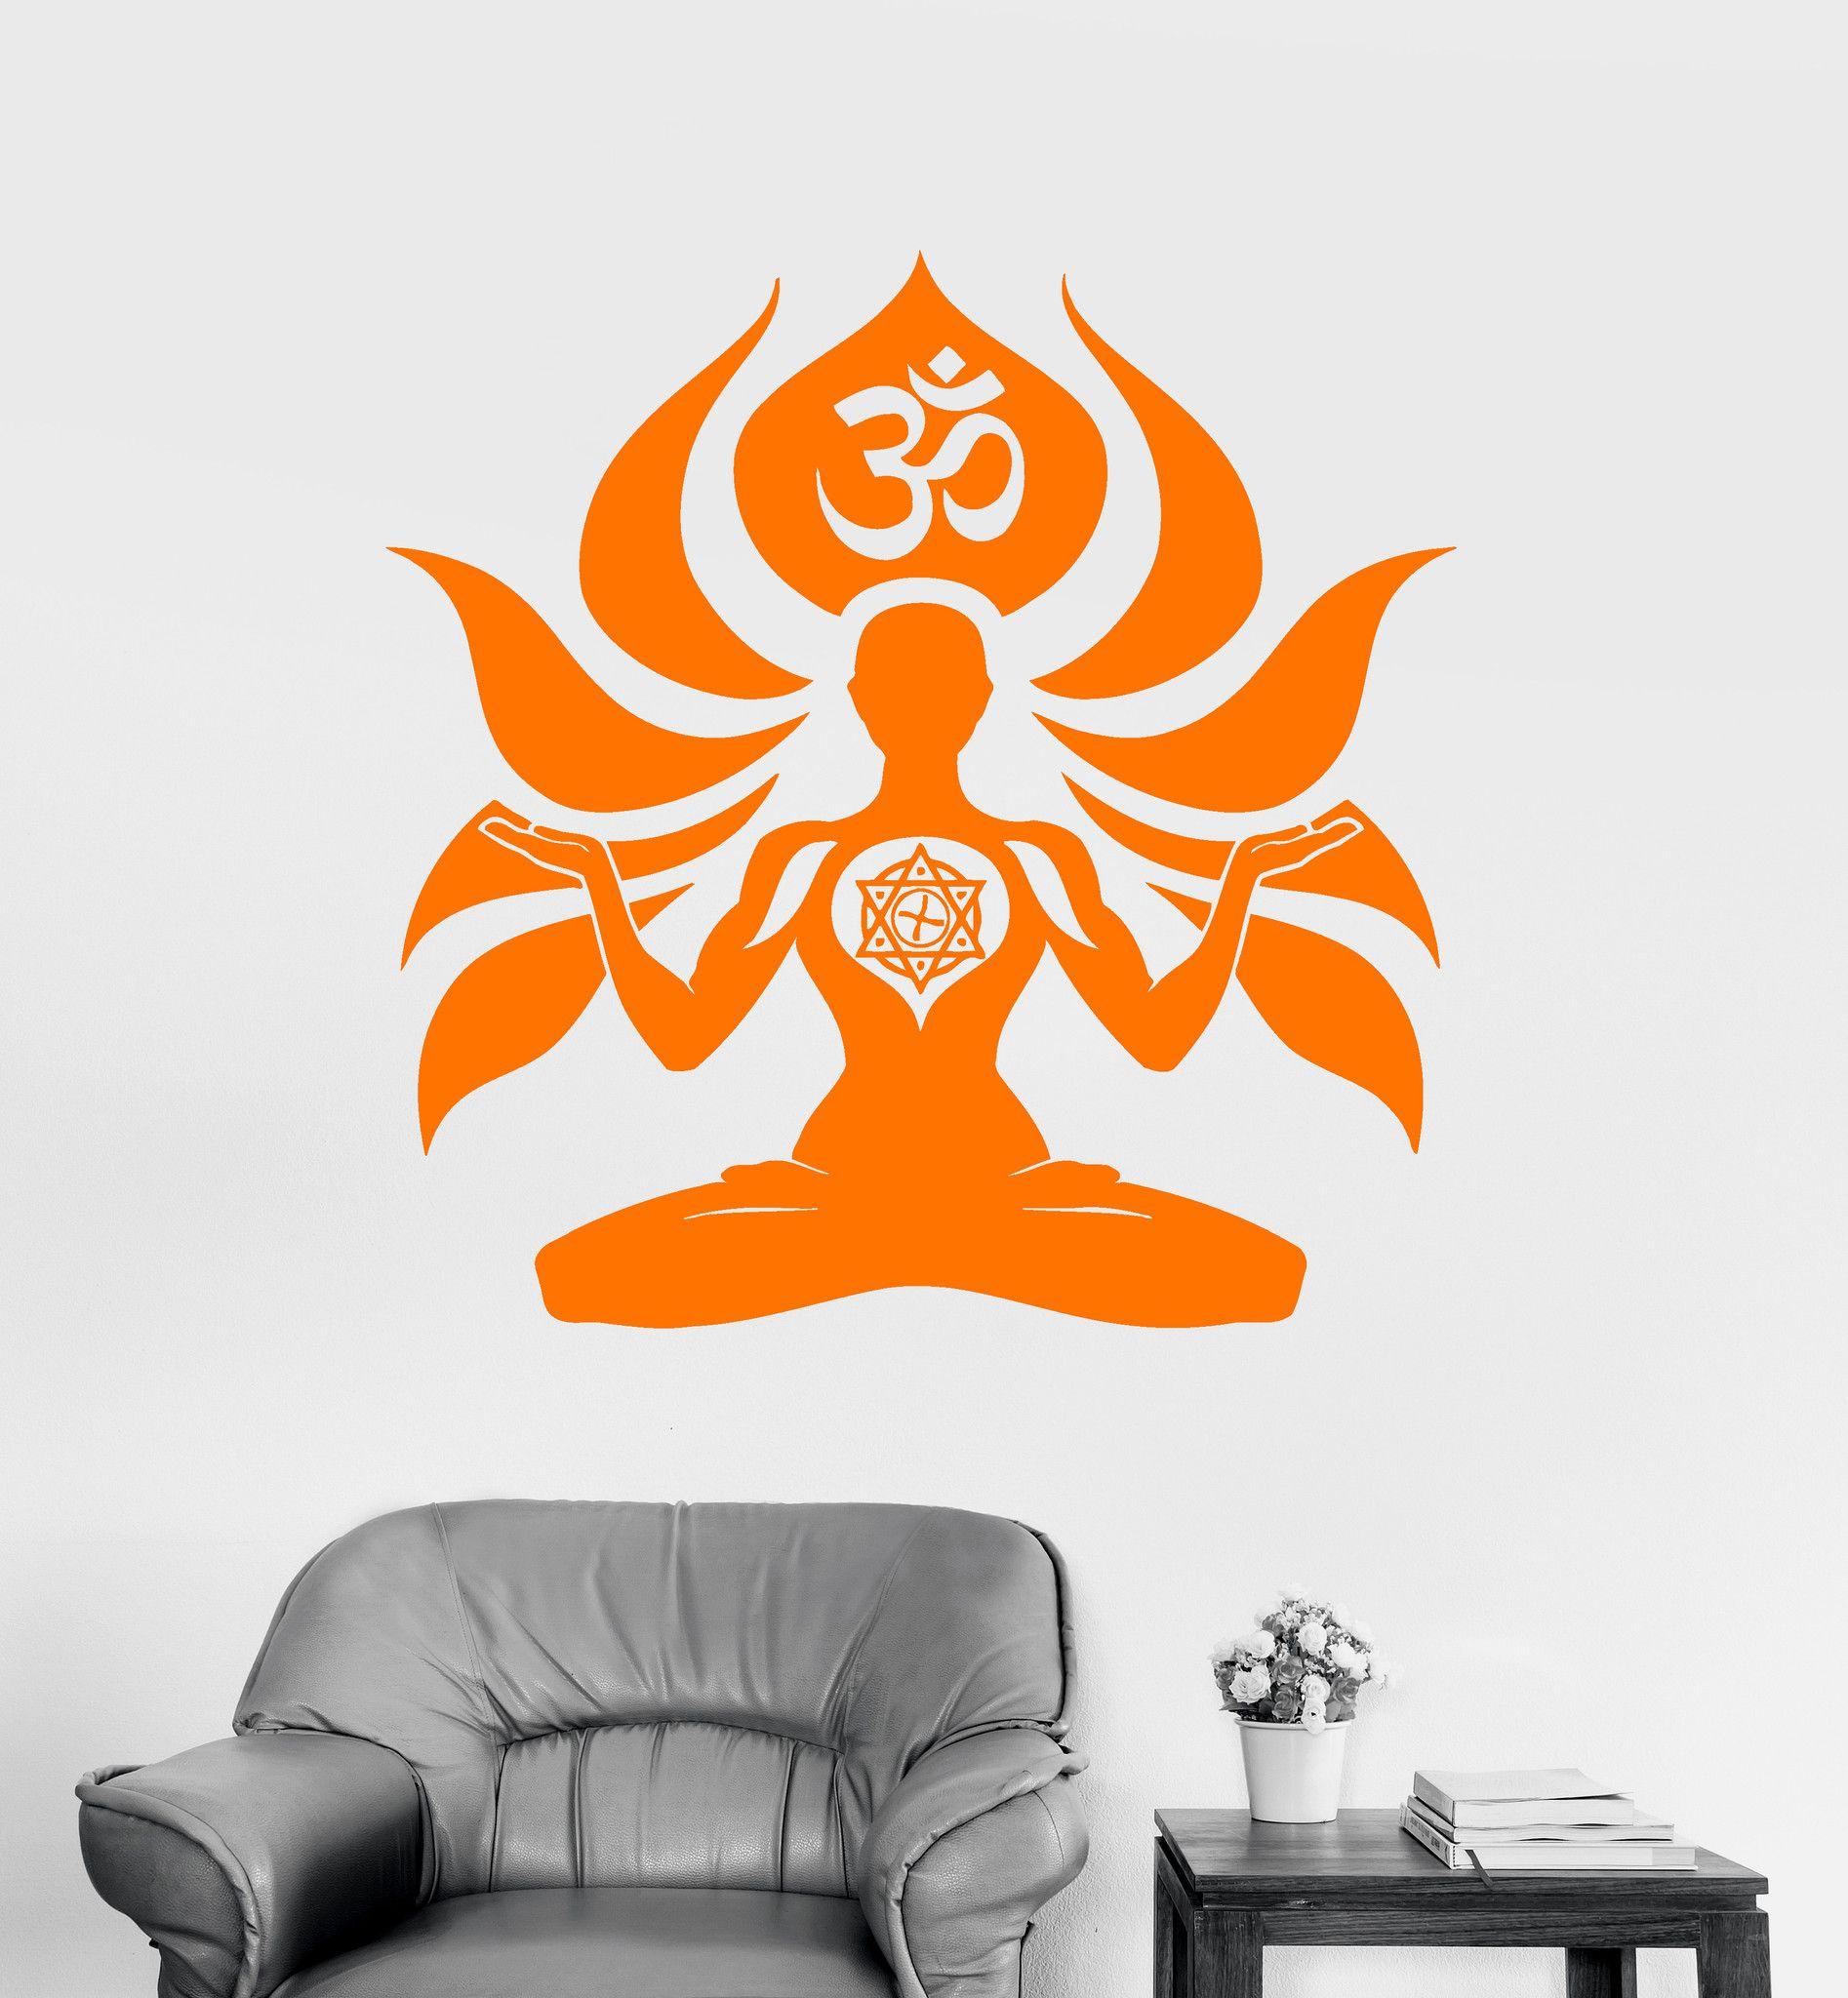 Vinyl Wall Decal Yoga Meditation Room Om Sanskrit Hinduism - Zen wall decalsvinyl wall decal yin yang yoga zen meditation bedroom decor